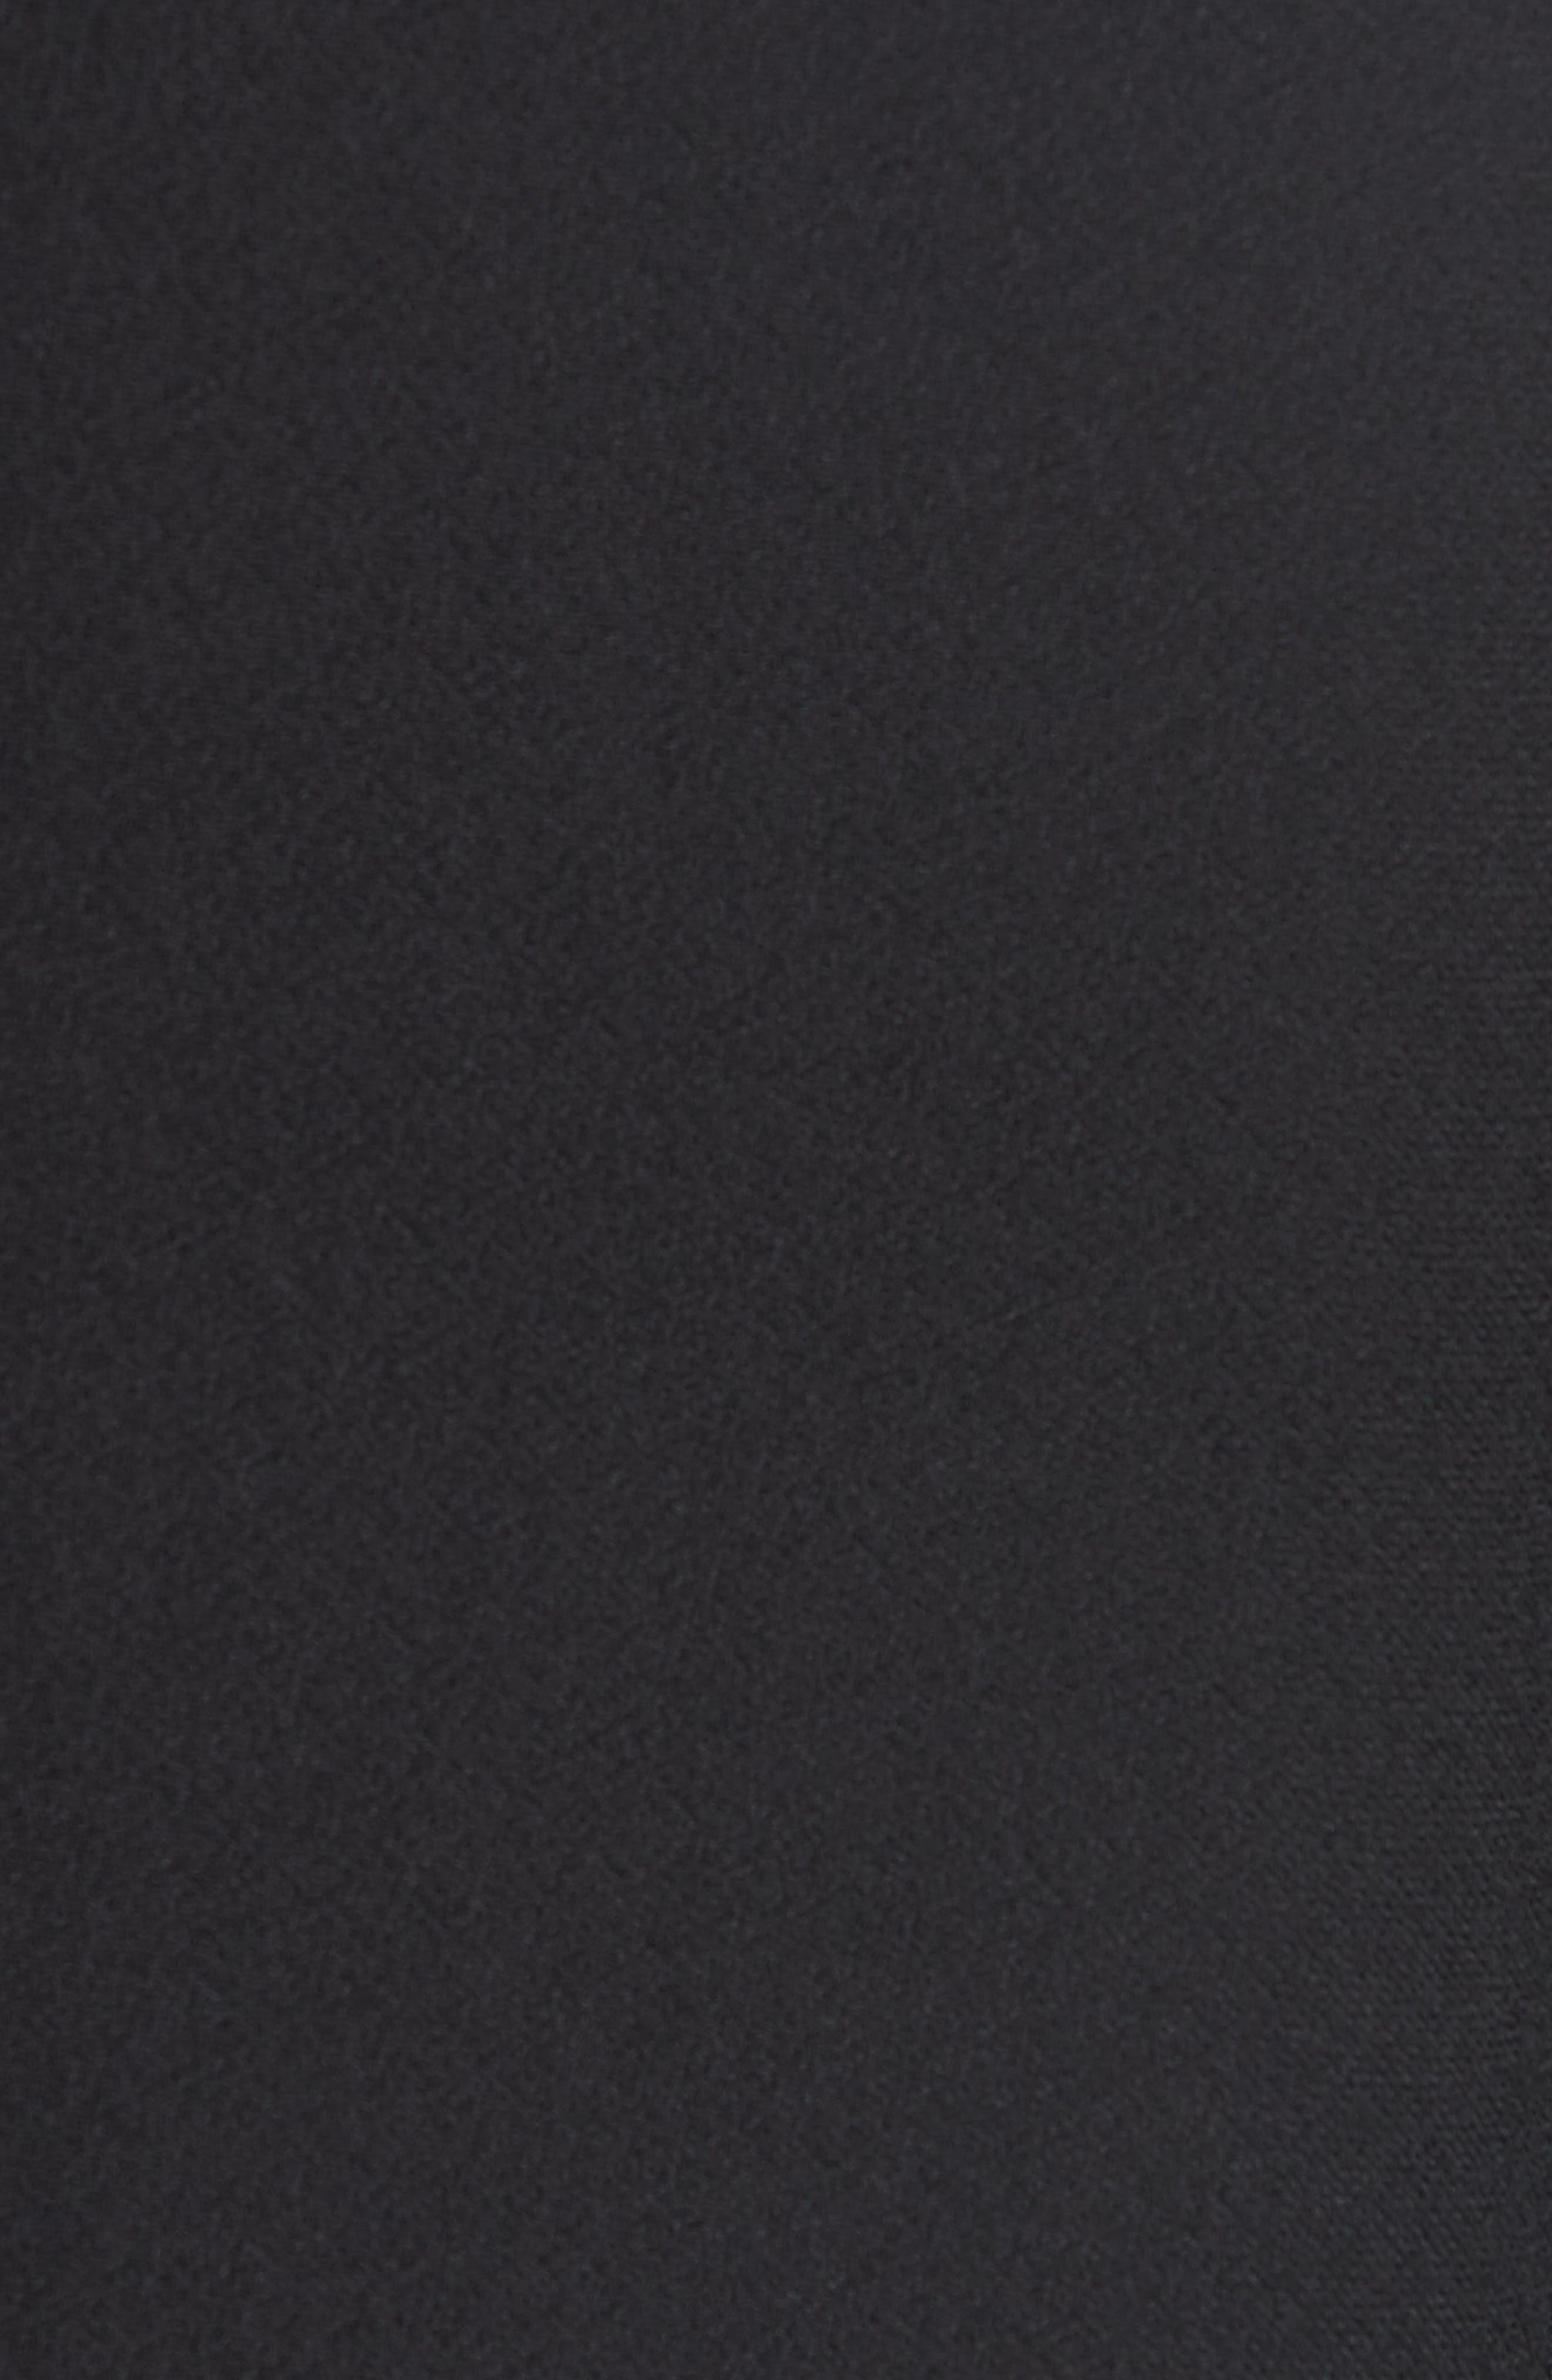 TED BAKER LONDON,                             Ashley Waterfall Sleeve A-Line Dress,                             Alternate thumbnail 5, color,                             001